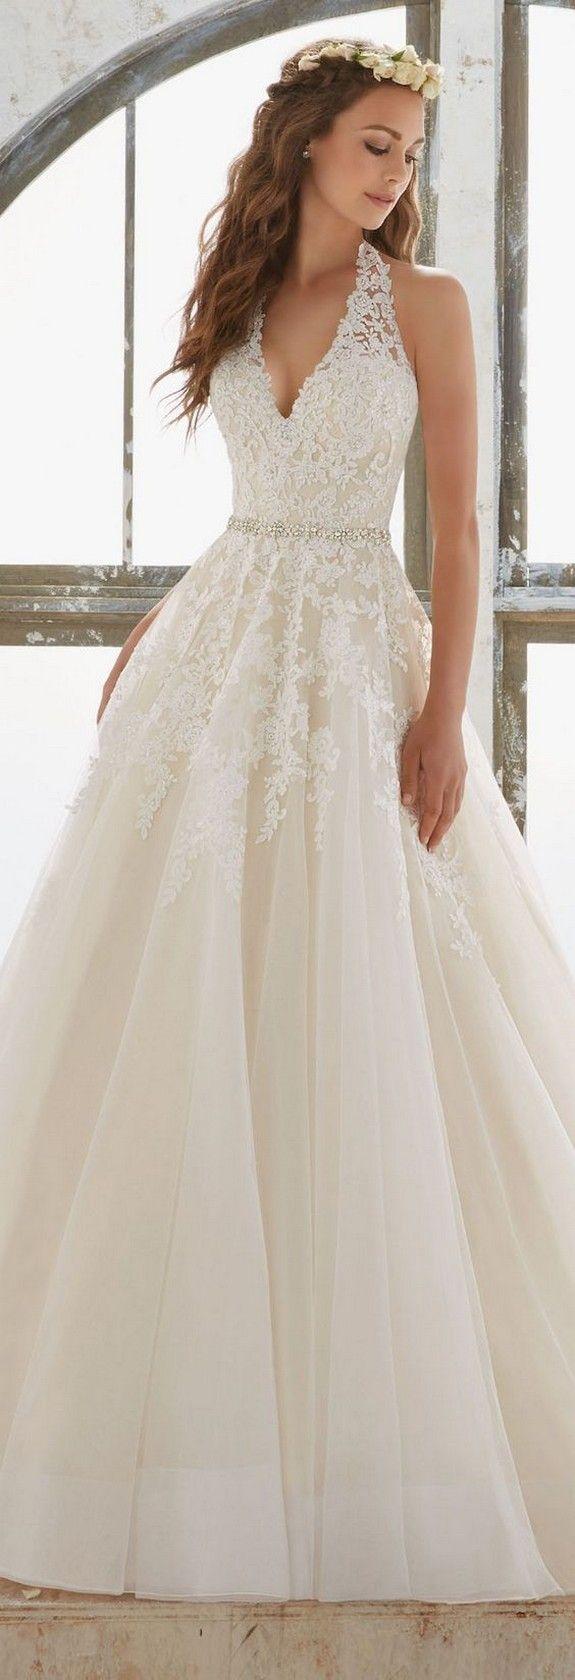 3800 best Wedding Dresses Ideas images on Pinterest   Wedding frocks ...